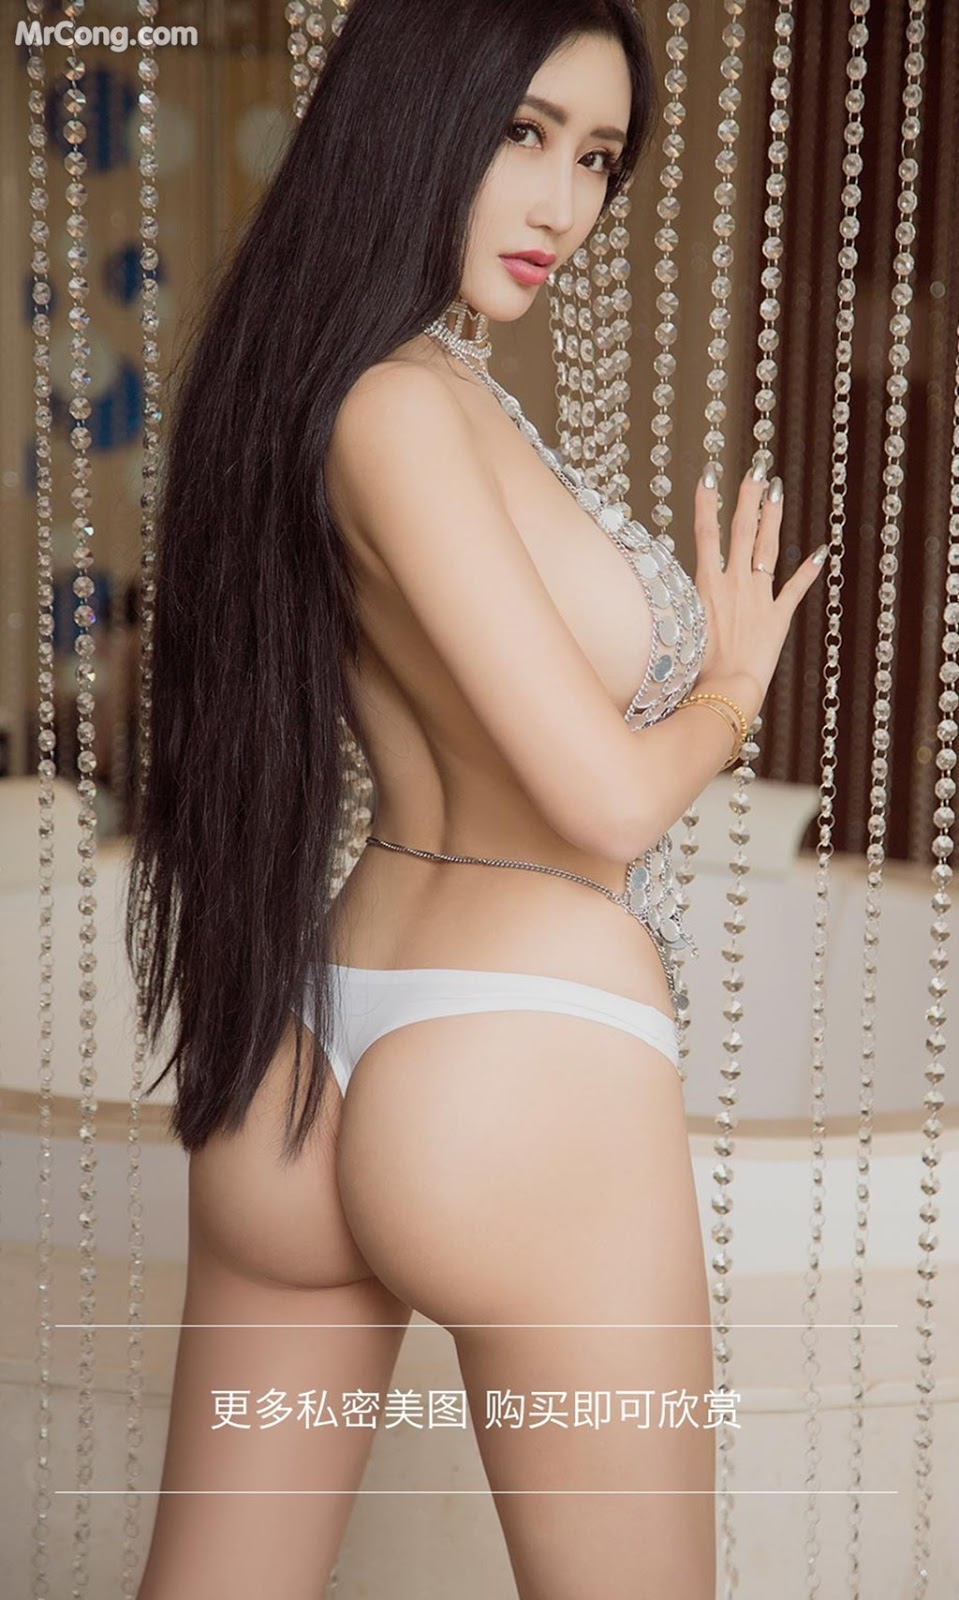 Image UGIRLS-Ai-You-Wu-App-No.811-Ai-Ni-Sha-MrCong.com-009 in post UGIRLS – Ai You Wu App No.811: Người mẫu Ai Ni Sha (艾霓莎) (40 ảnh)